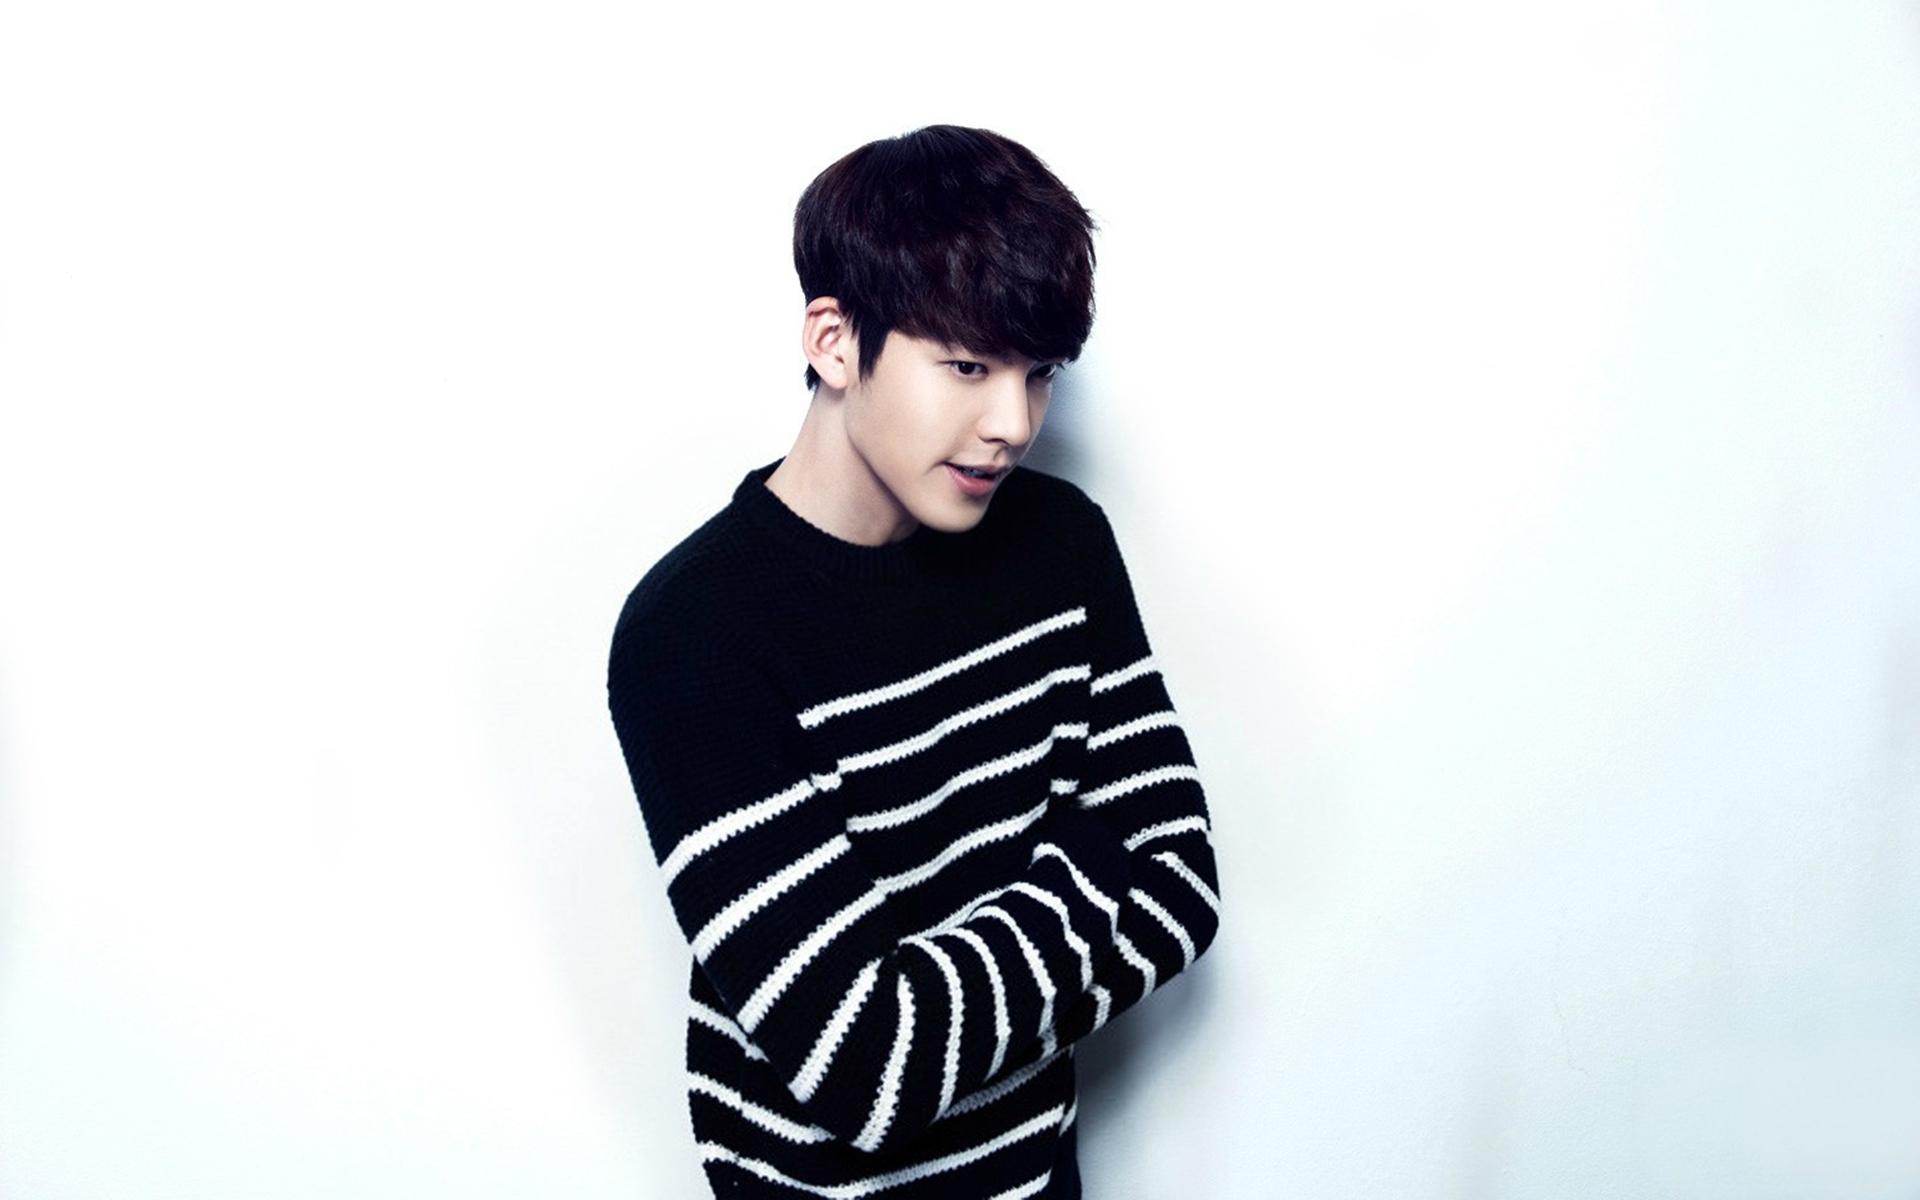 Pictures Of Kim Woo Bin